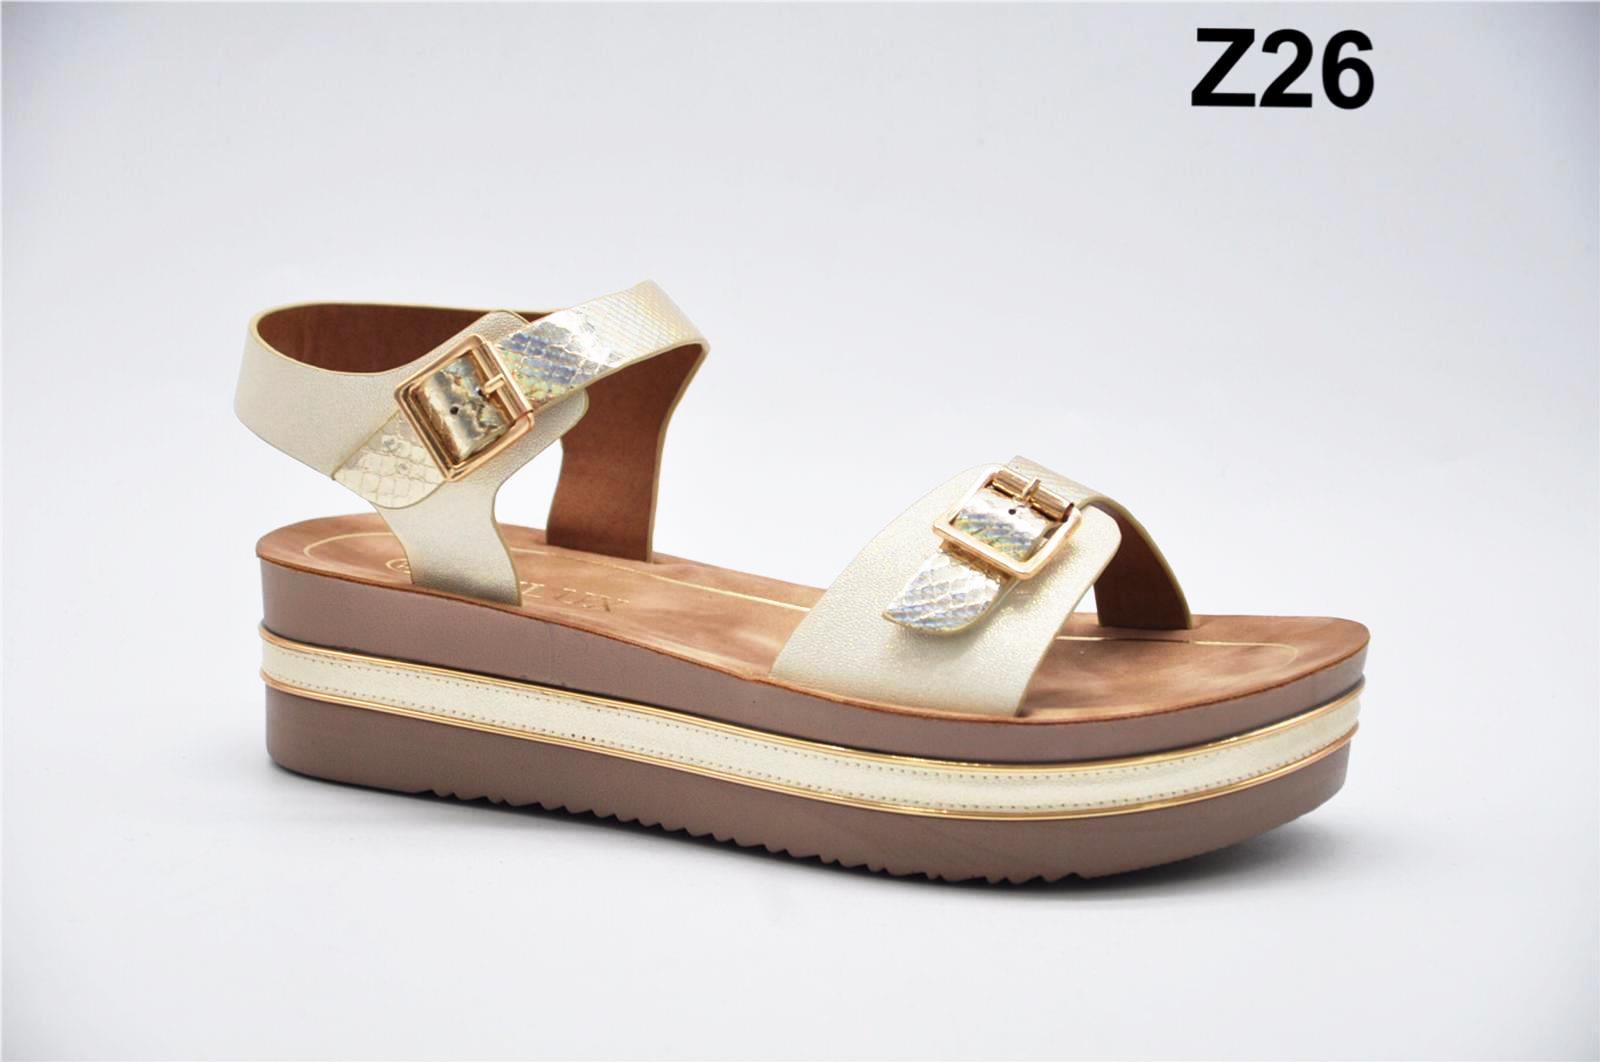 Sandale dama bej cu auriu Monica2